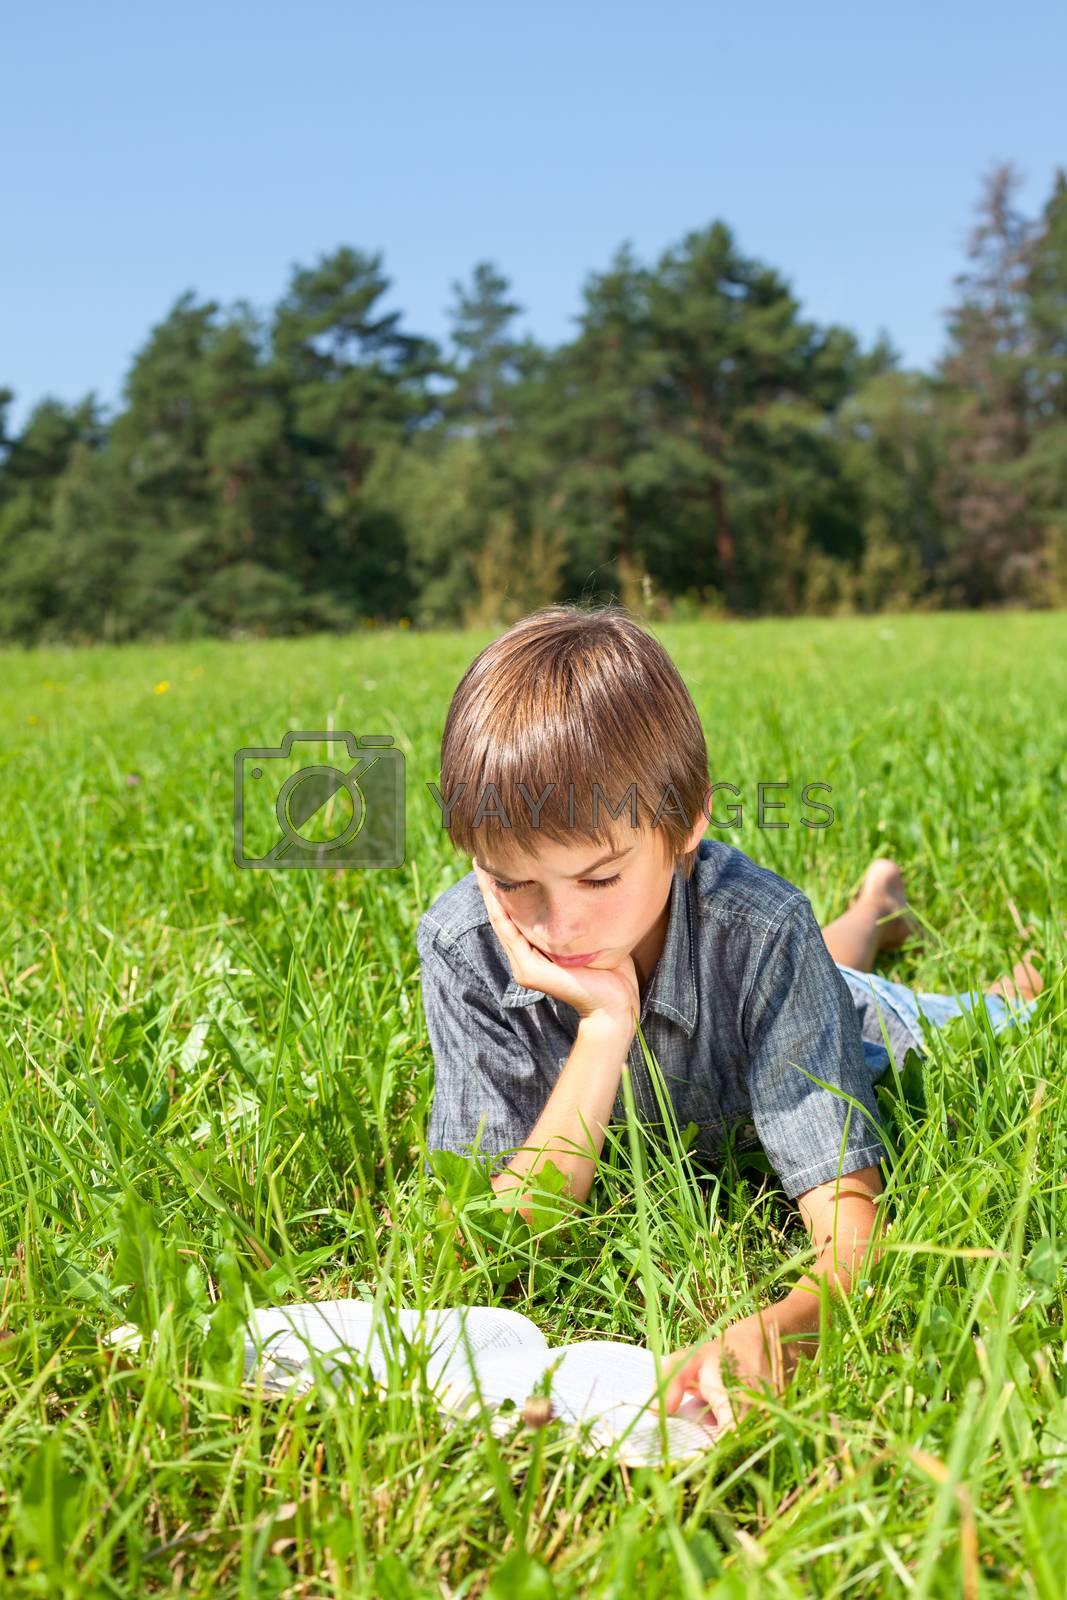 Boy lying in grass reading a book in a summer field